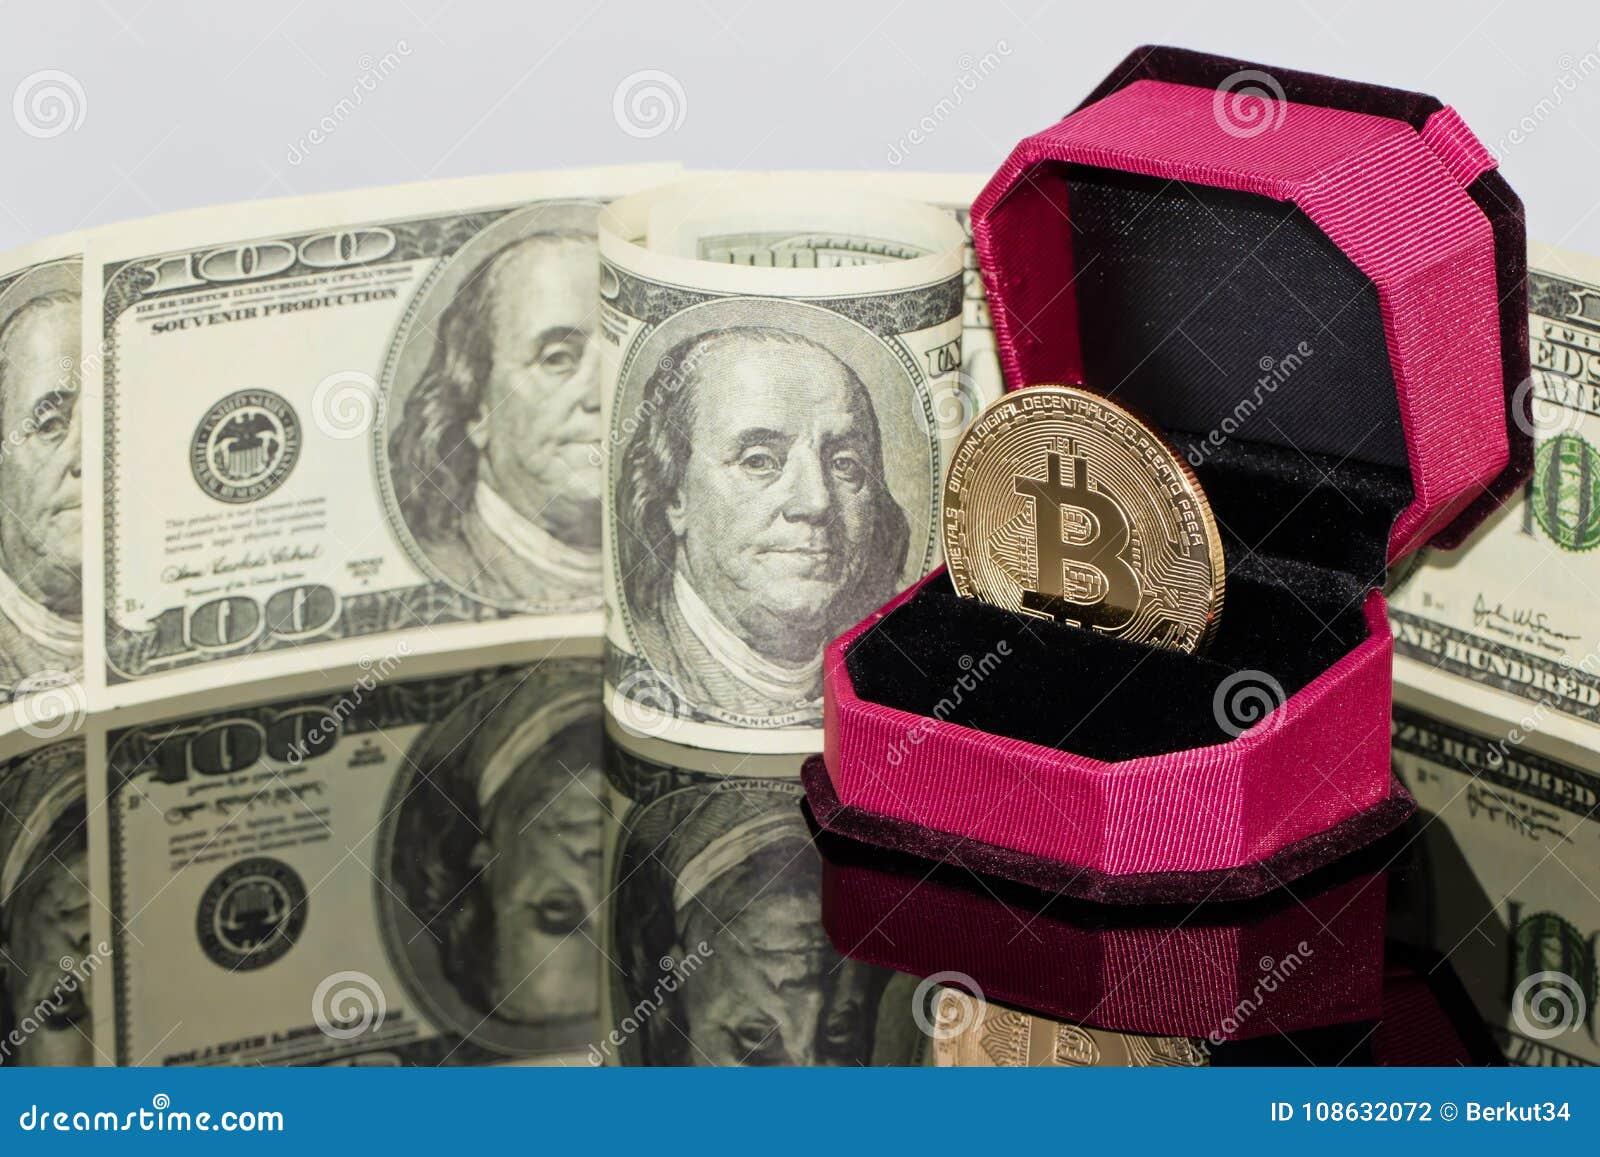 bitcoin into real money